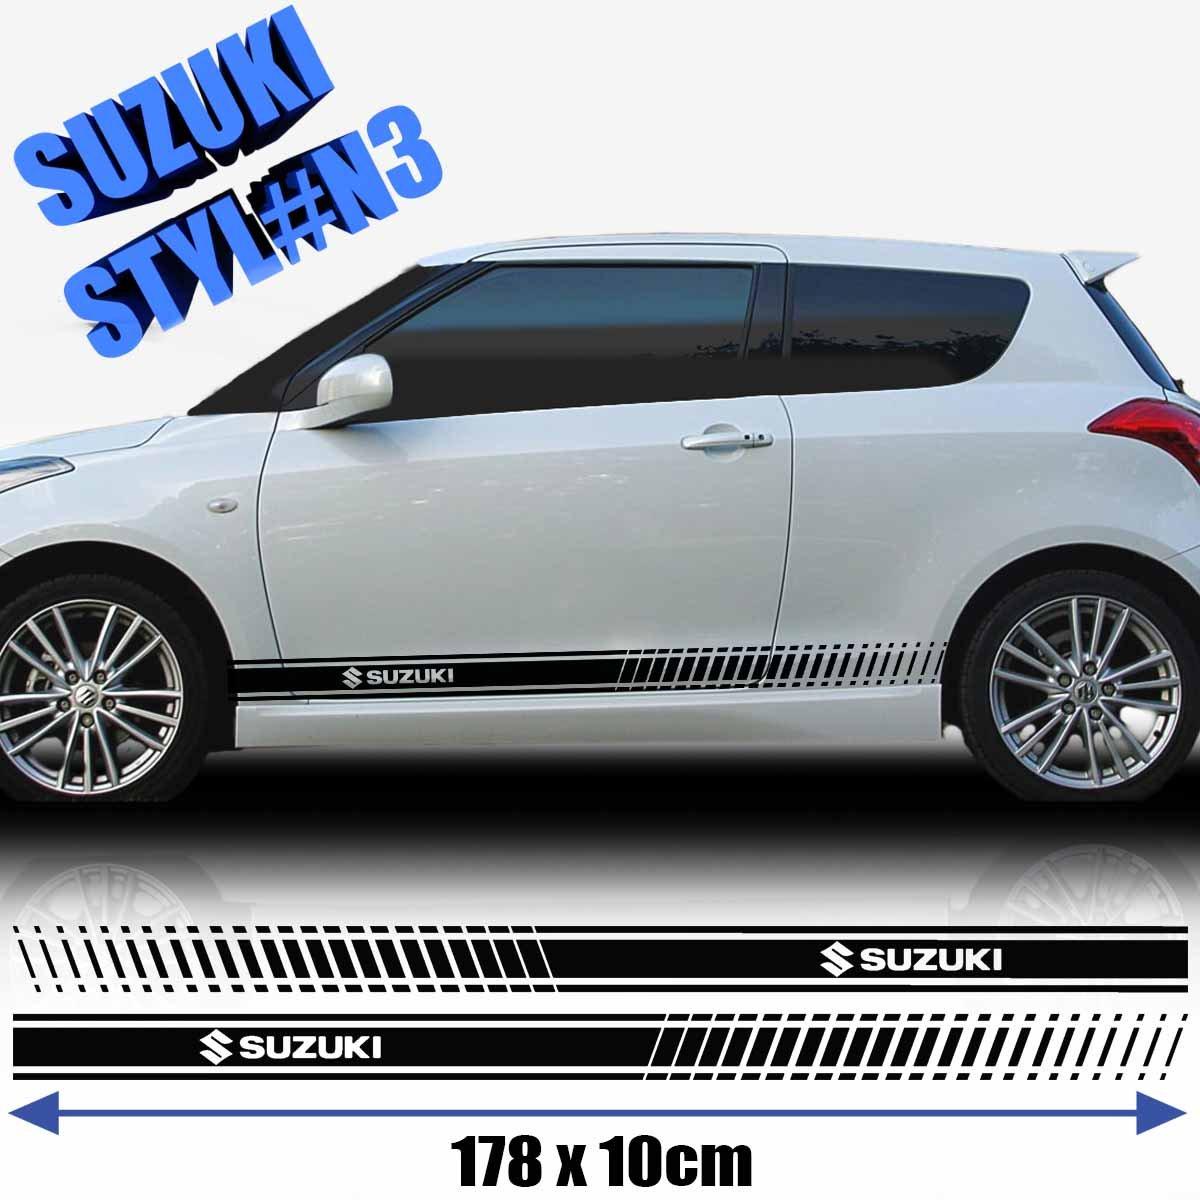 Suzuki swift sports side racing stripes decal graphics tuning car size 178x10 cm black amazon co uk car motorbike